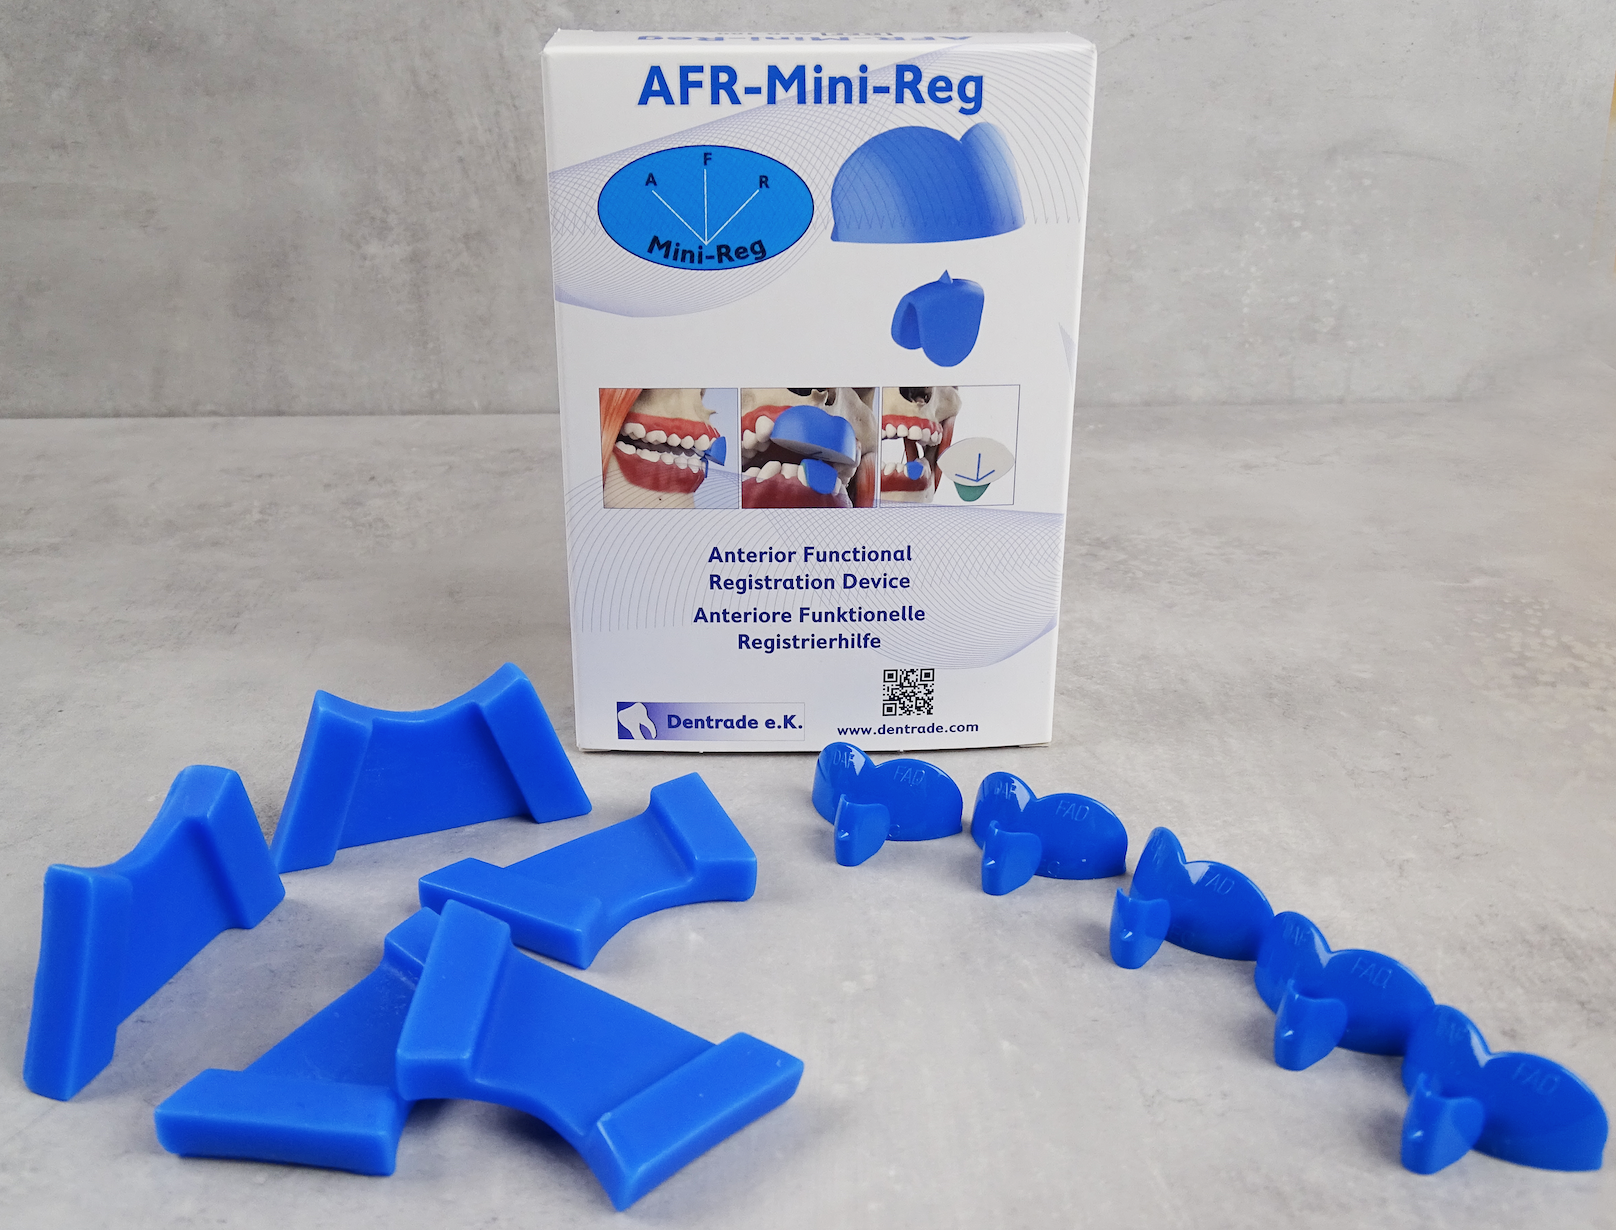 AFR-Mini-Reg